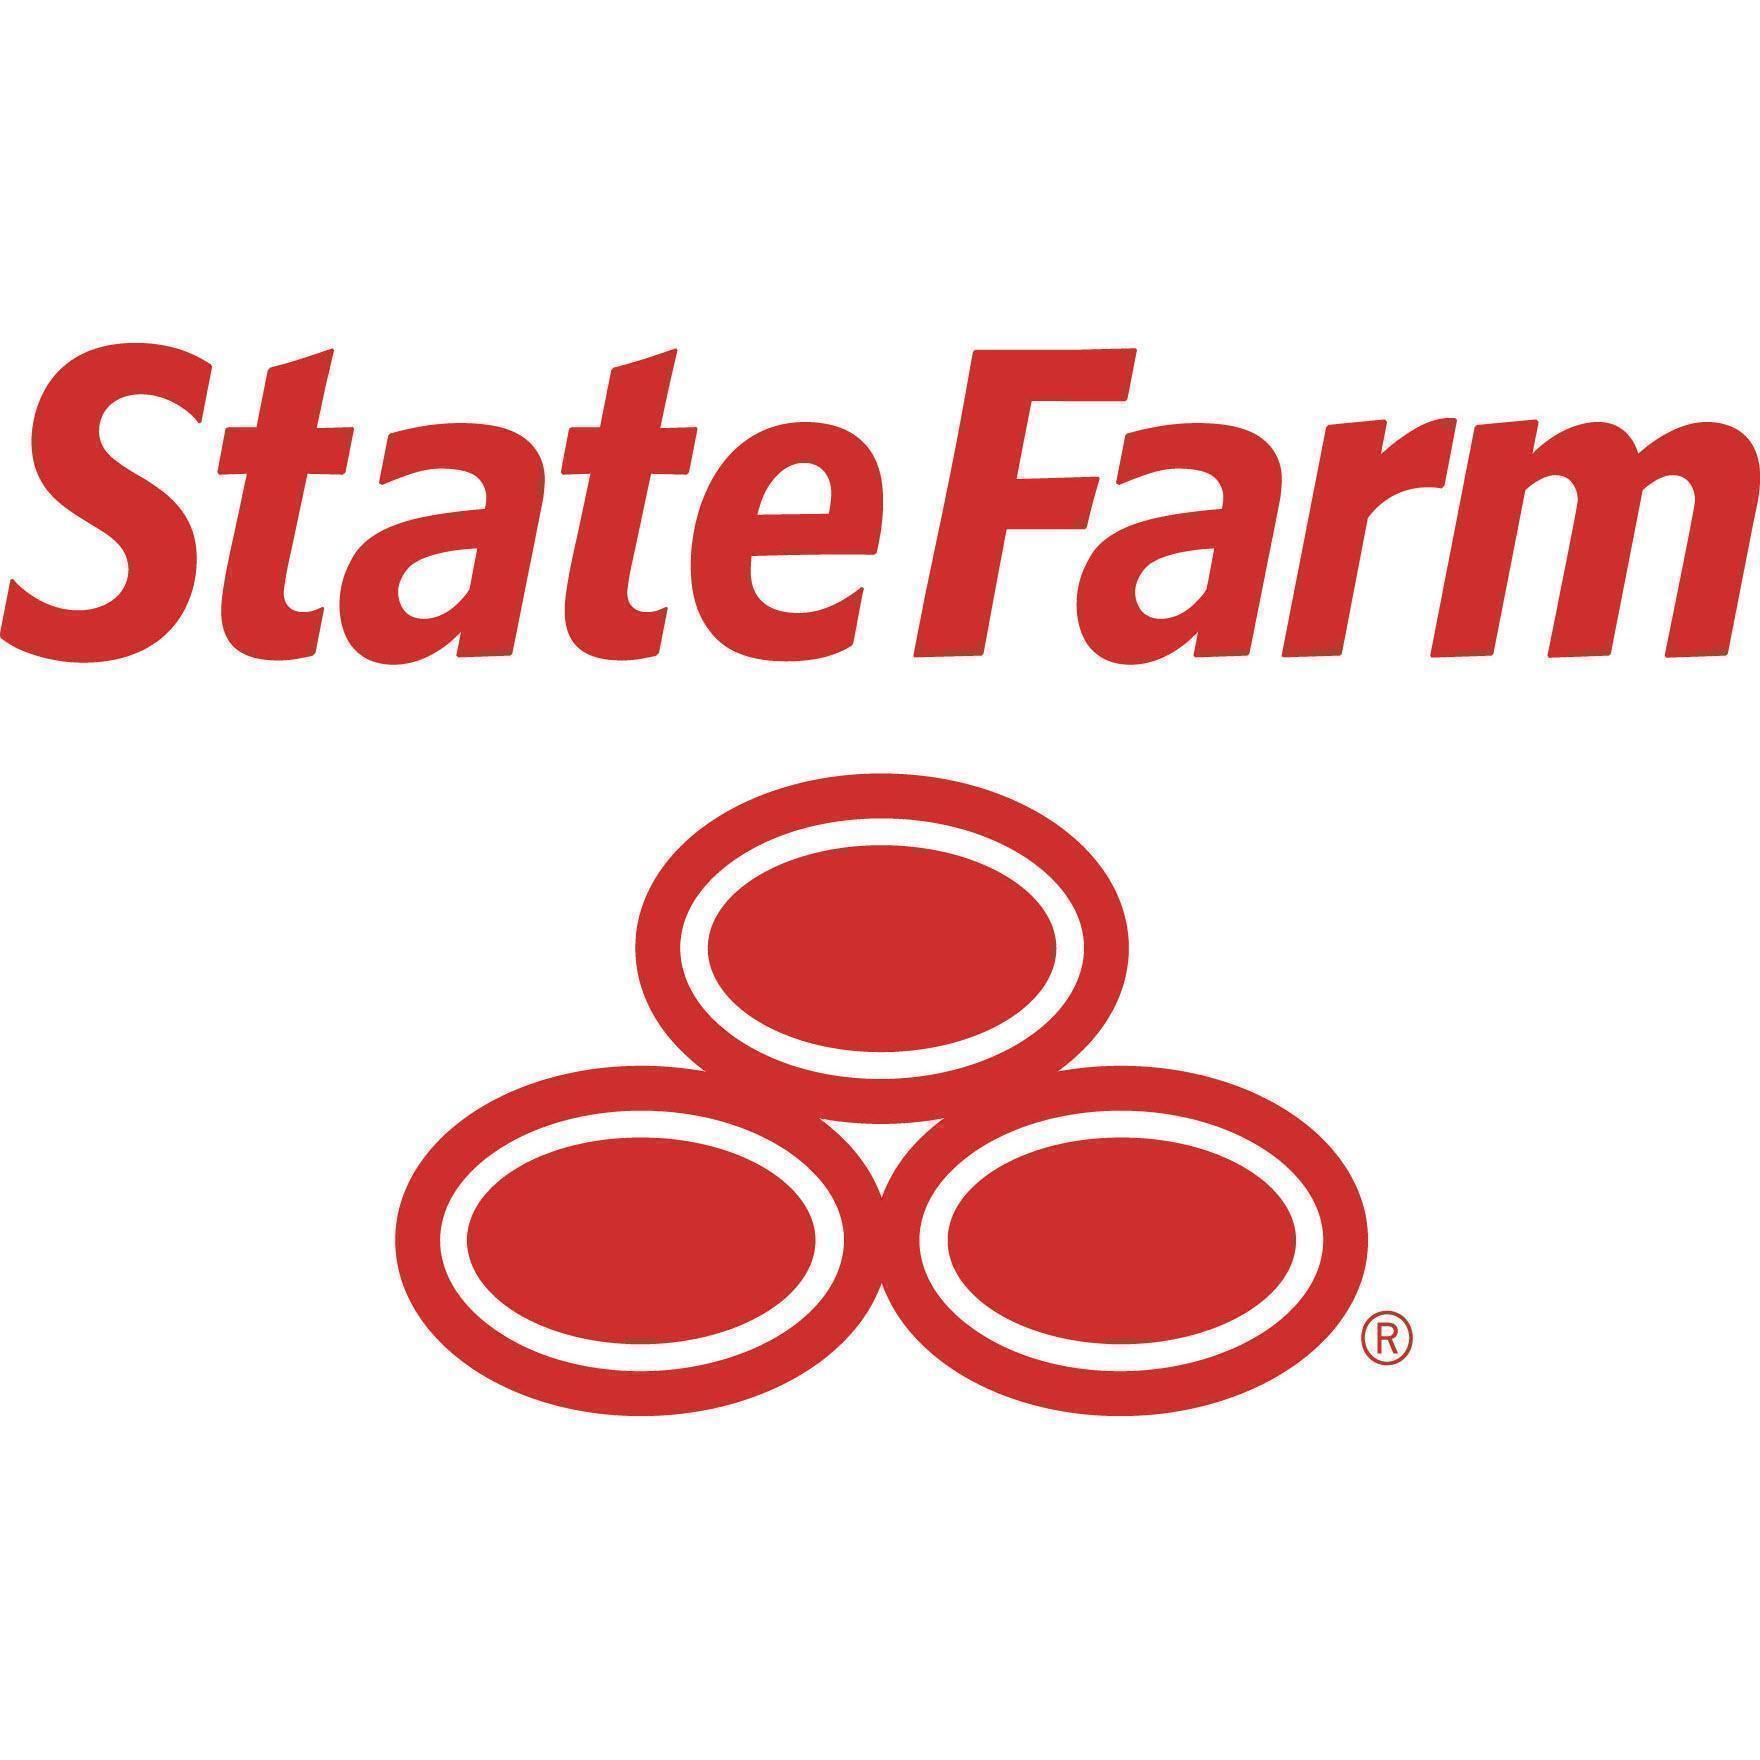 Maryam Stepanian - State Farm Insurance Agent